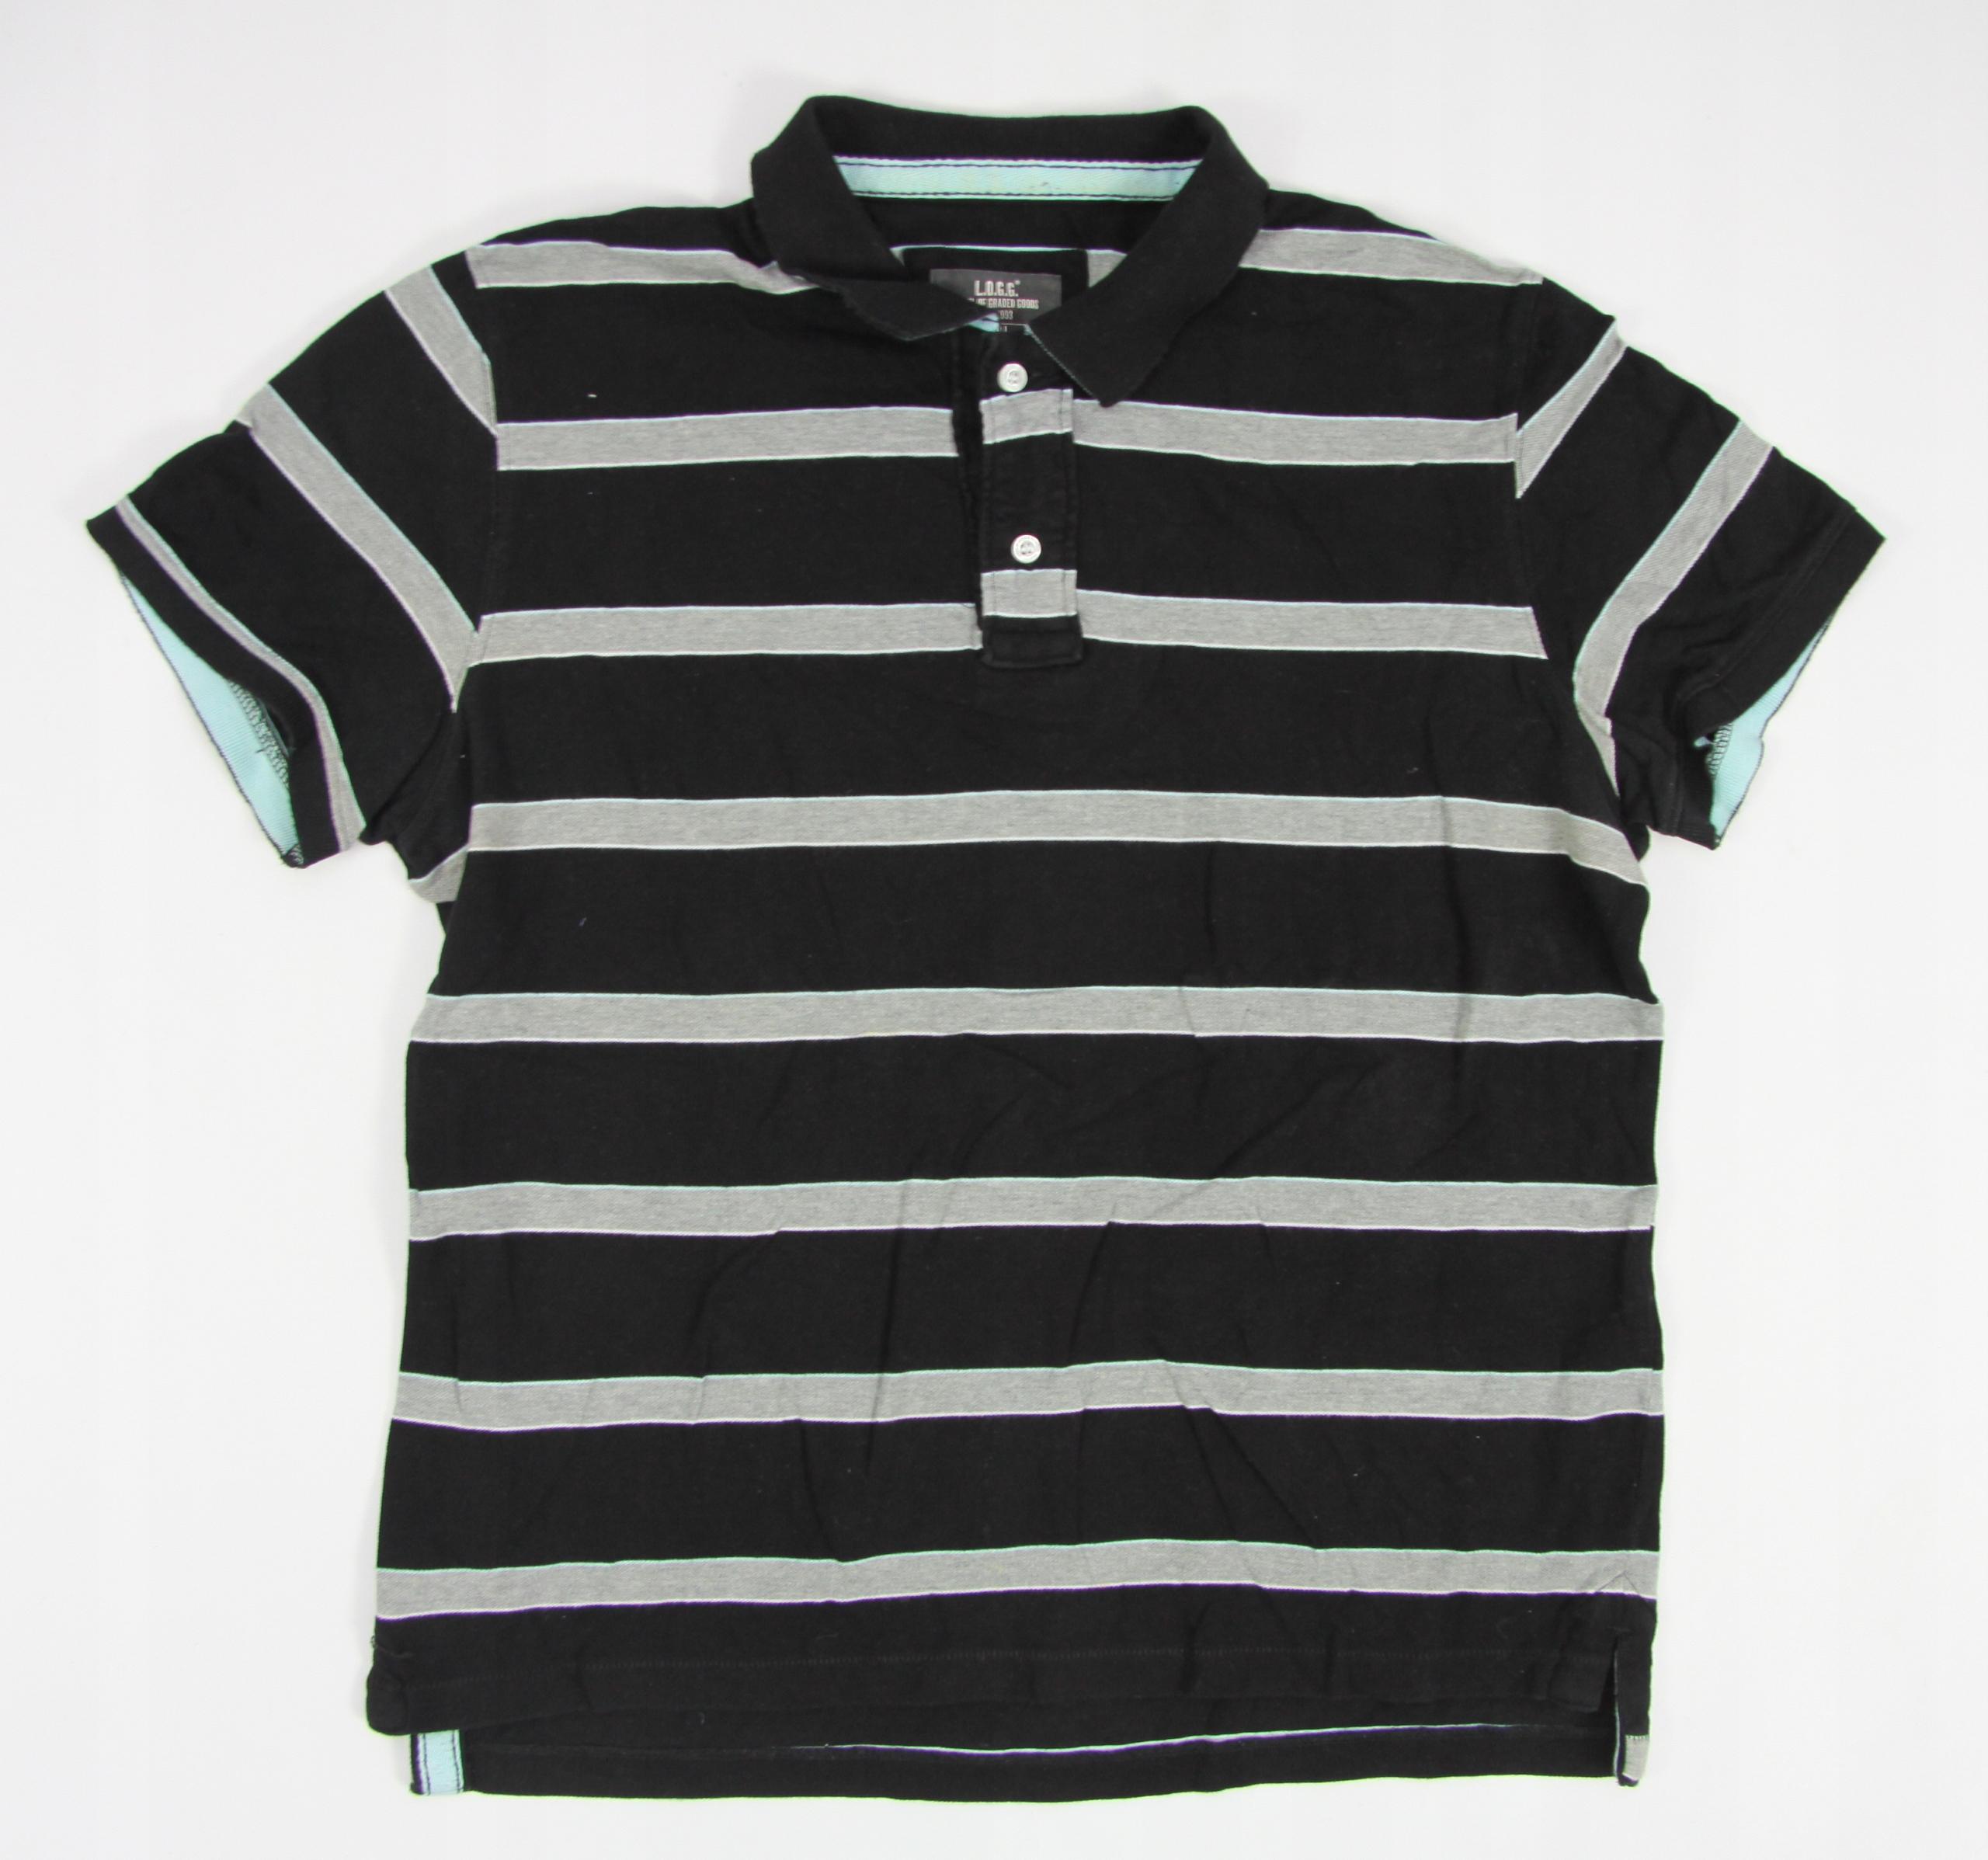 H&M koszulka polo męska 100% bawełna CZARNA L